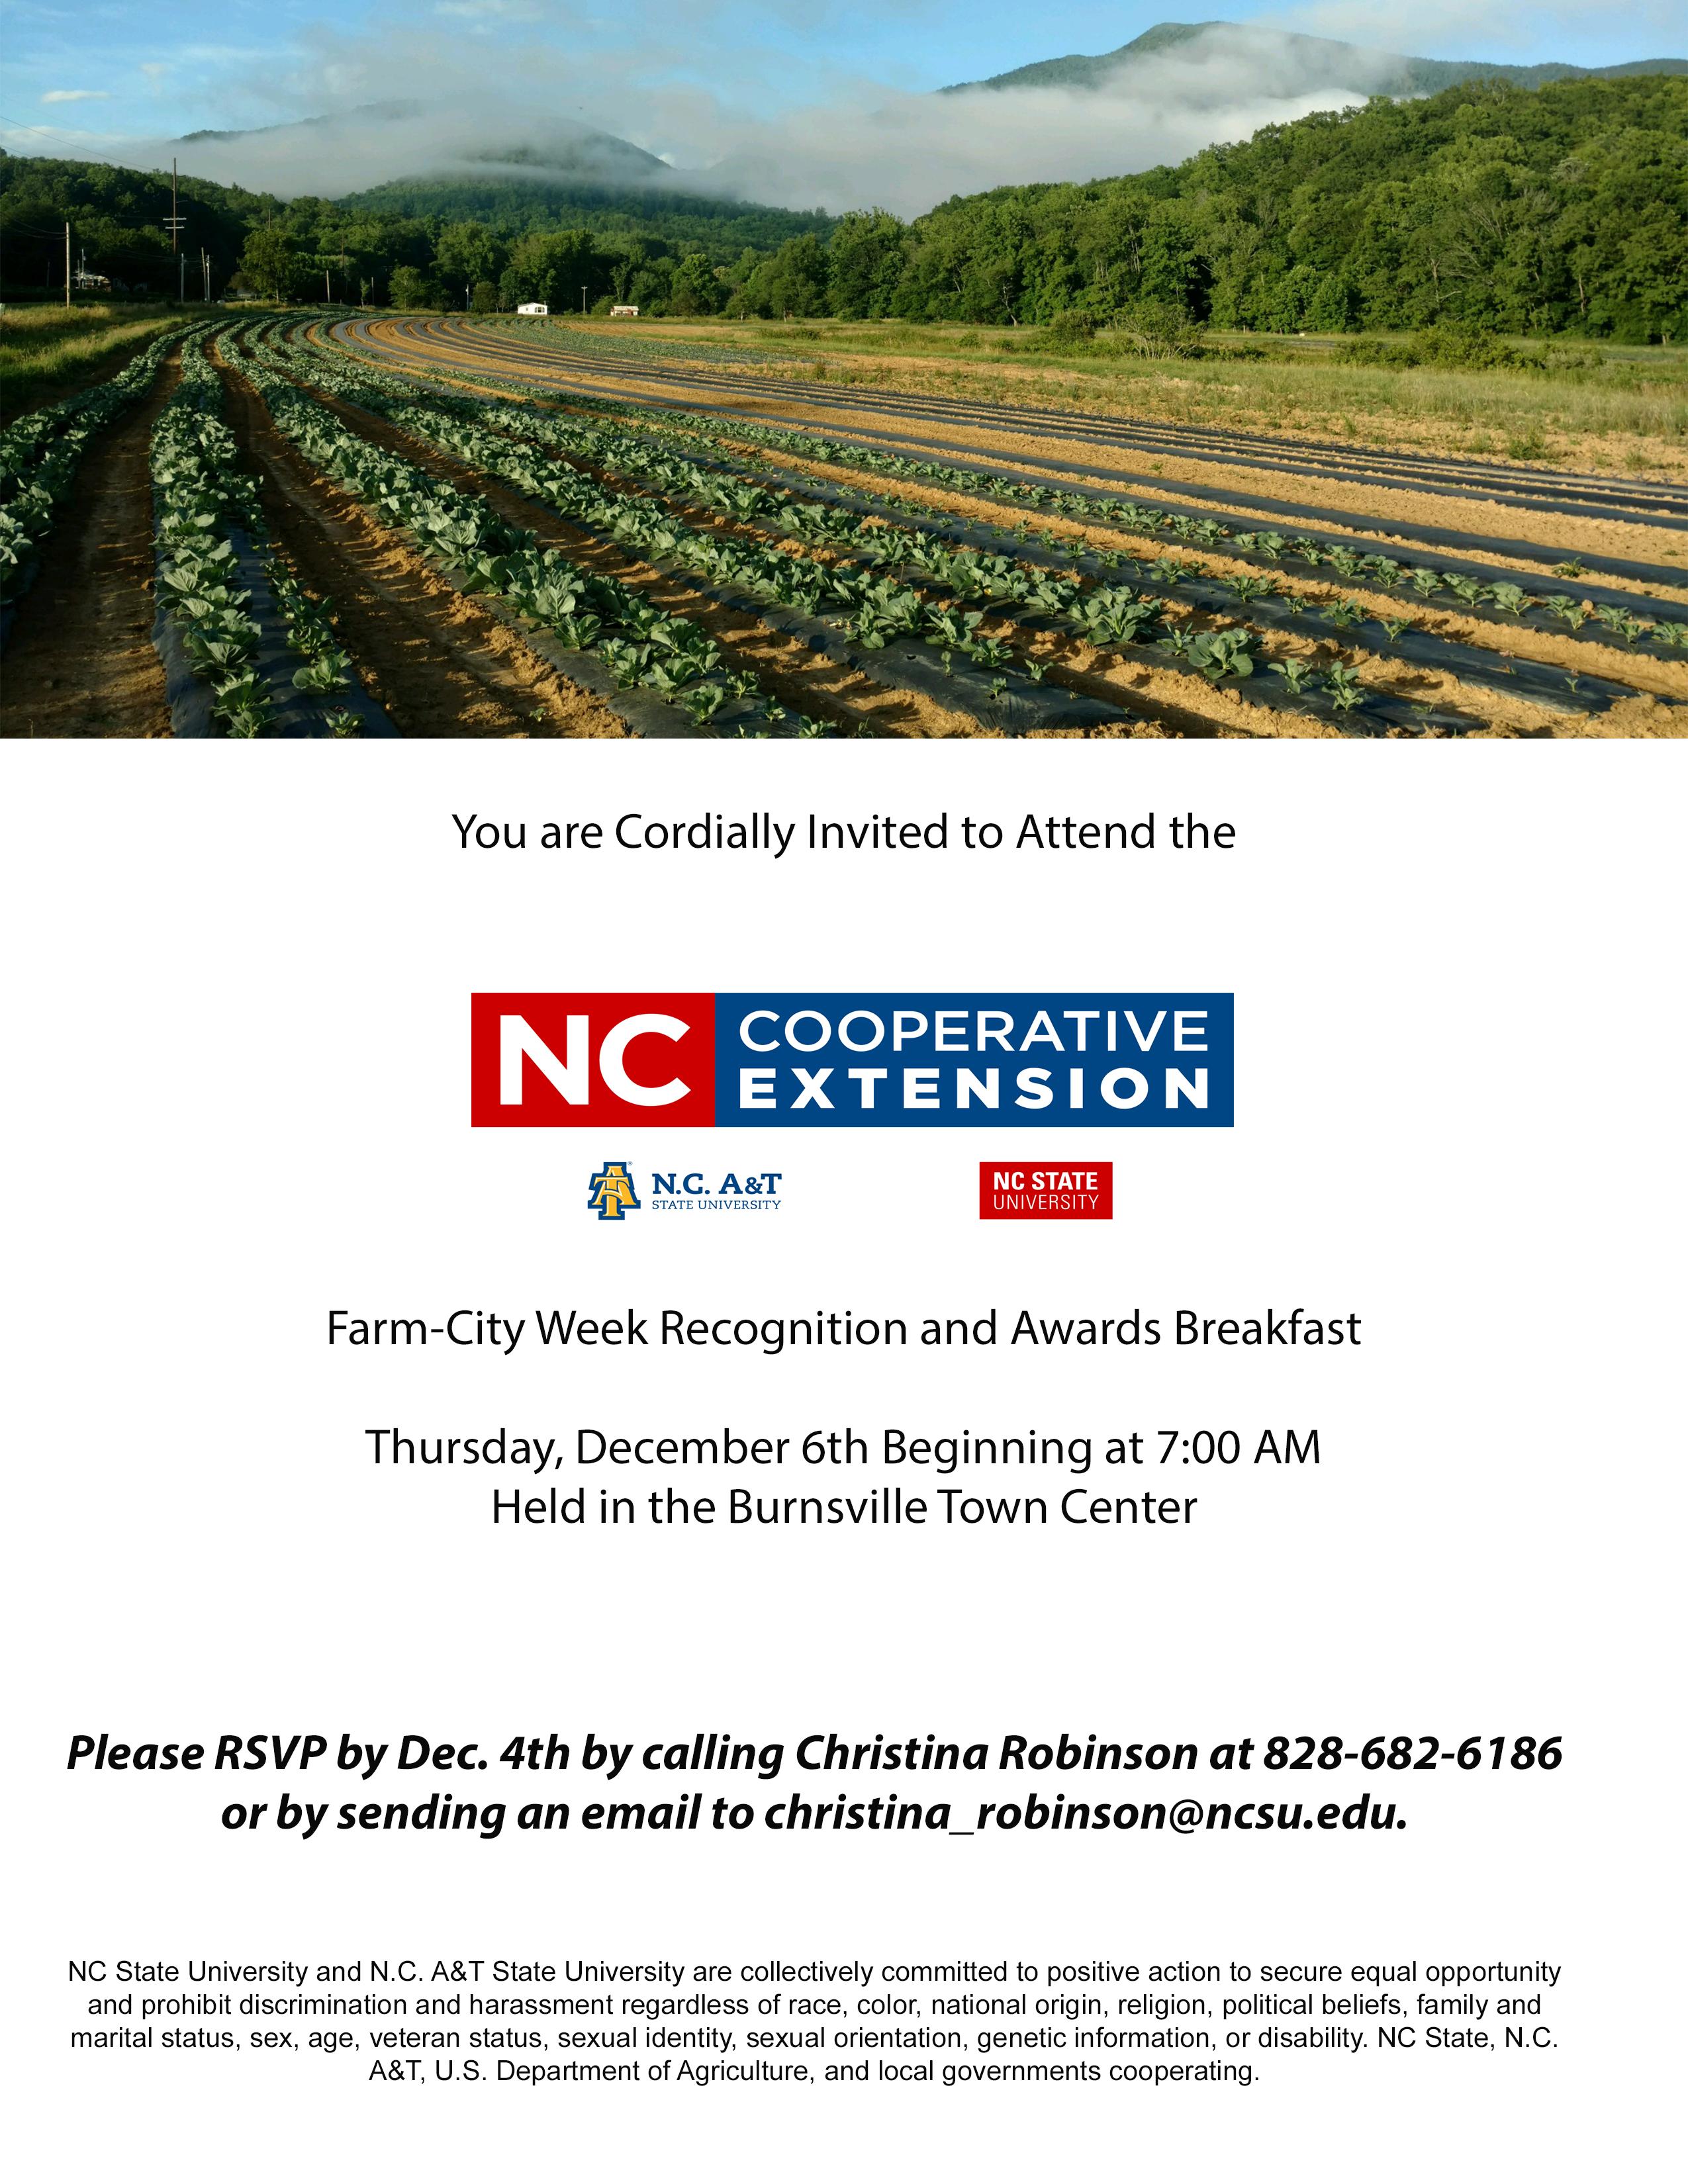 Farm City Awards Breakfast flyer image